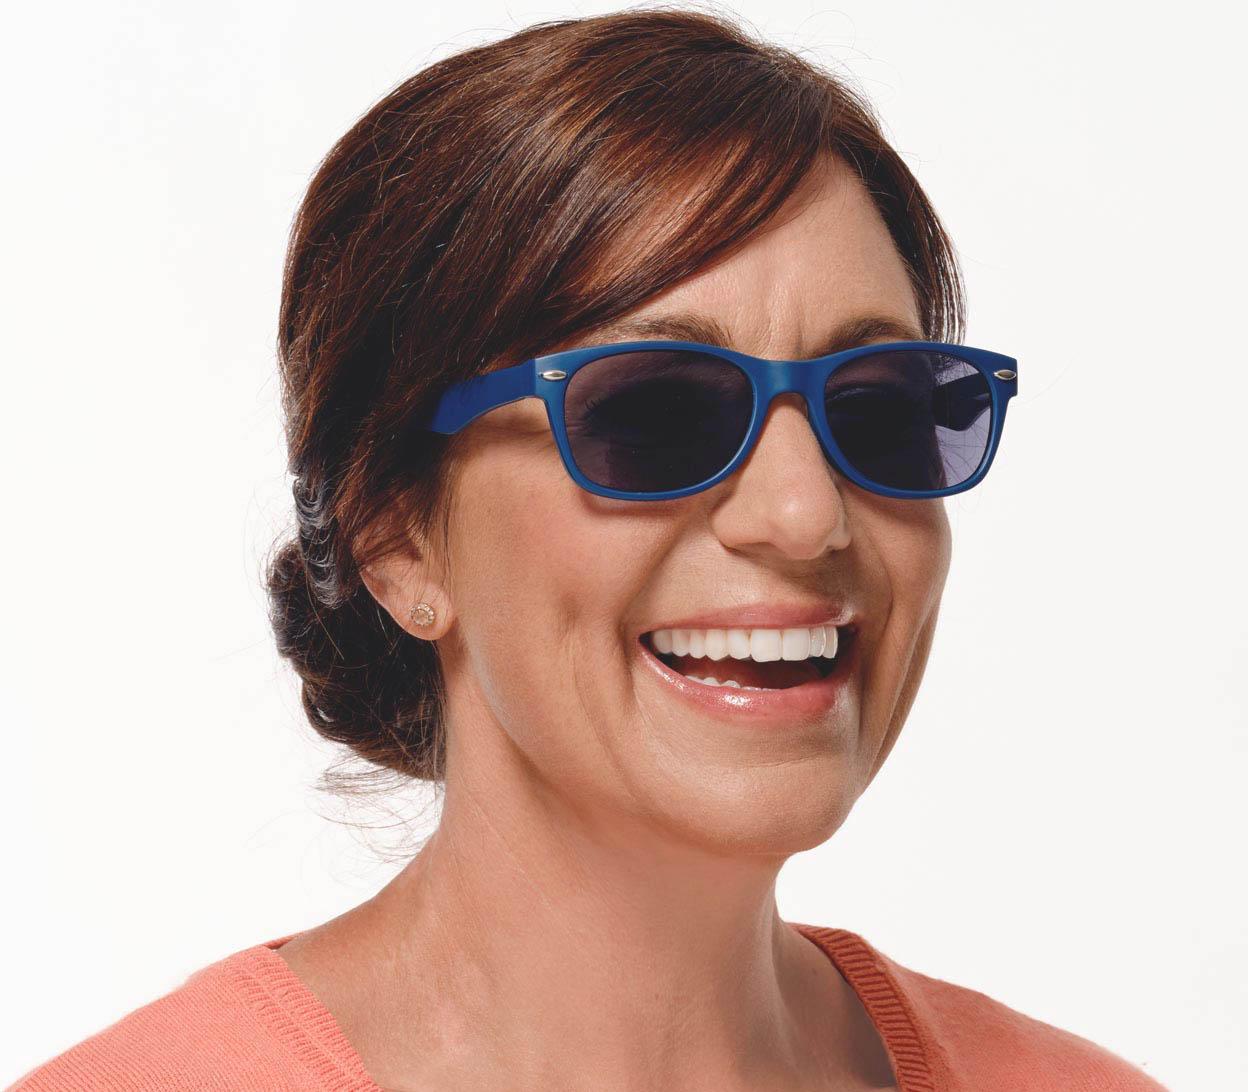 Woman wearing reading sunglasses